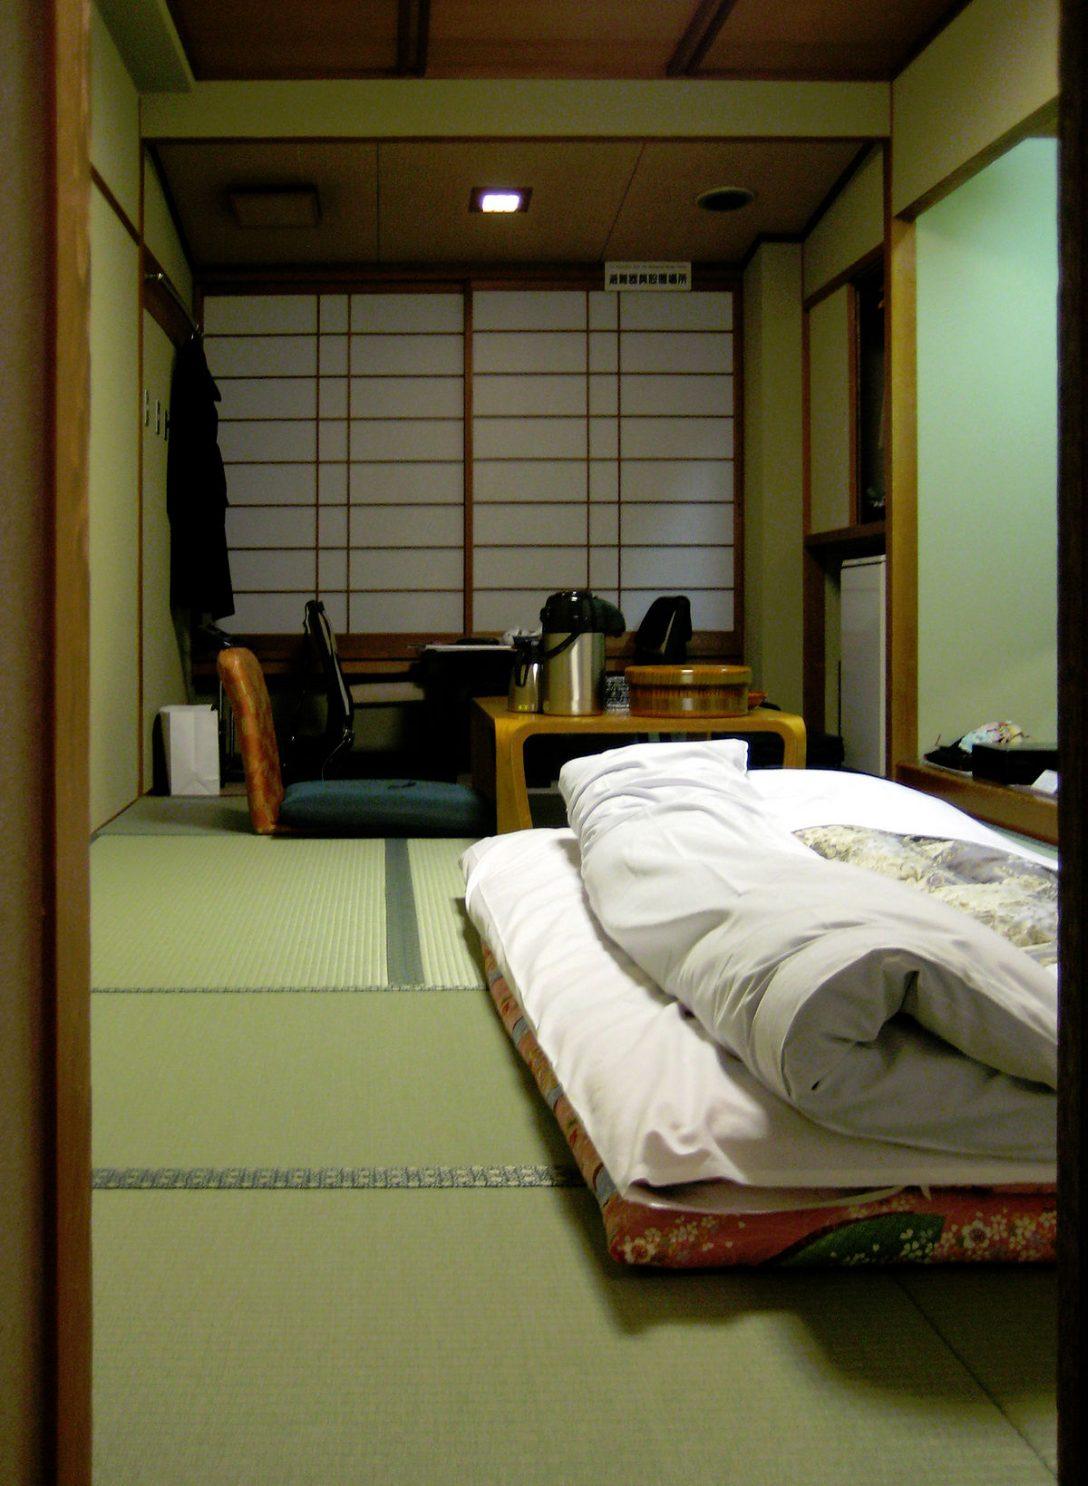 Large Size of Japanische Betten Futon Wikipedia Antike Günstig Kaufen 180x200 Hasena Test Bonprix Teenager Massivholz 160x200 Team 7 Möbel Boss Holz Moebel Bett Japanische Betten